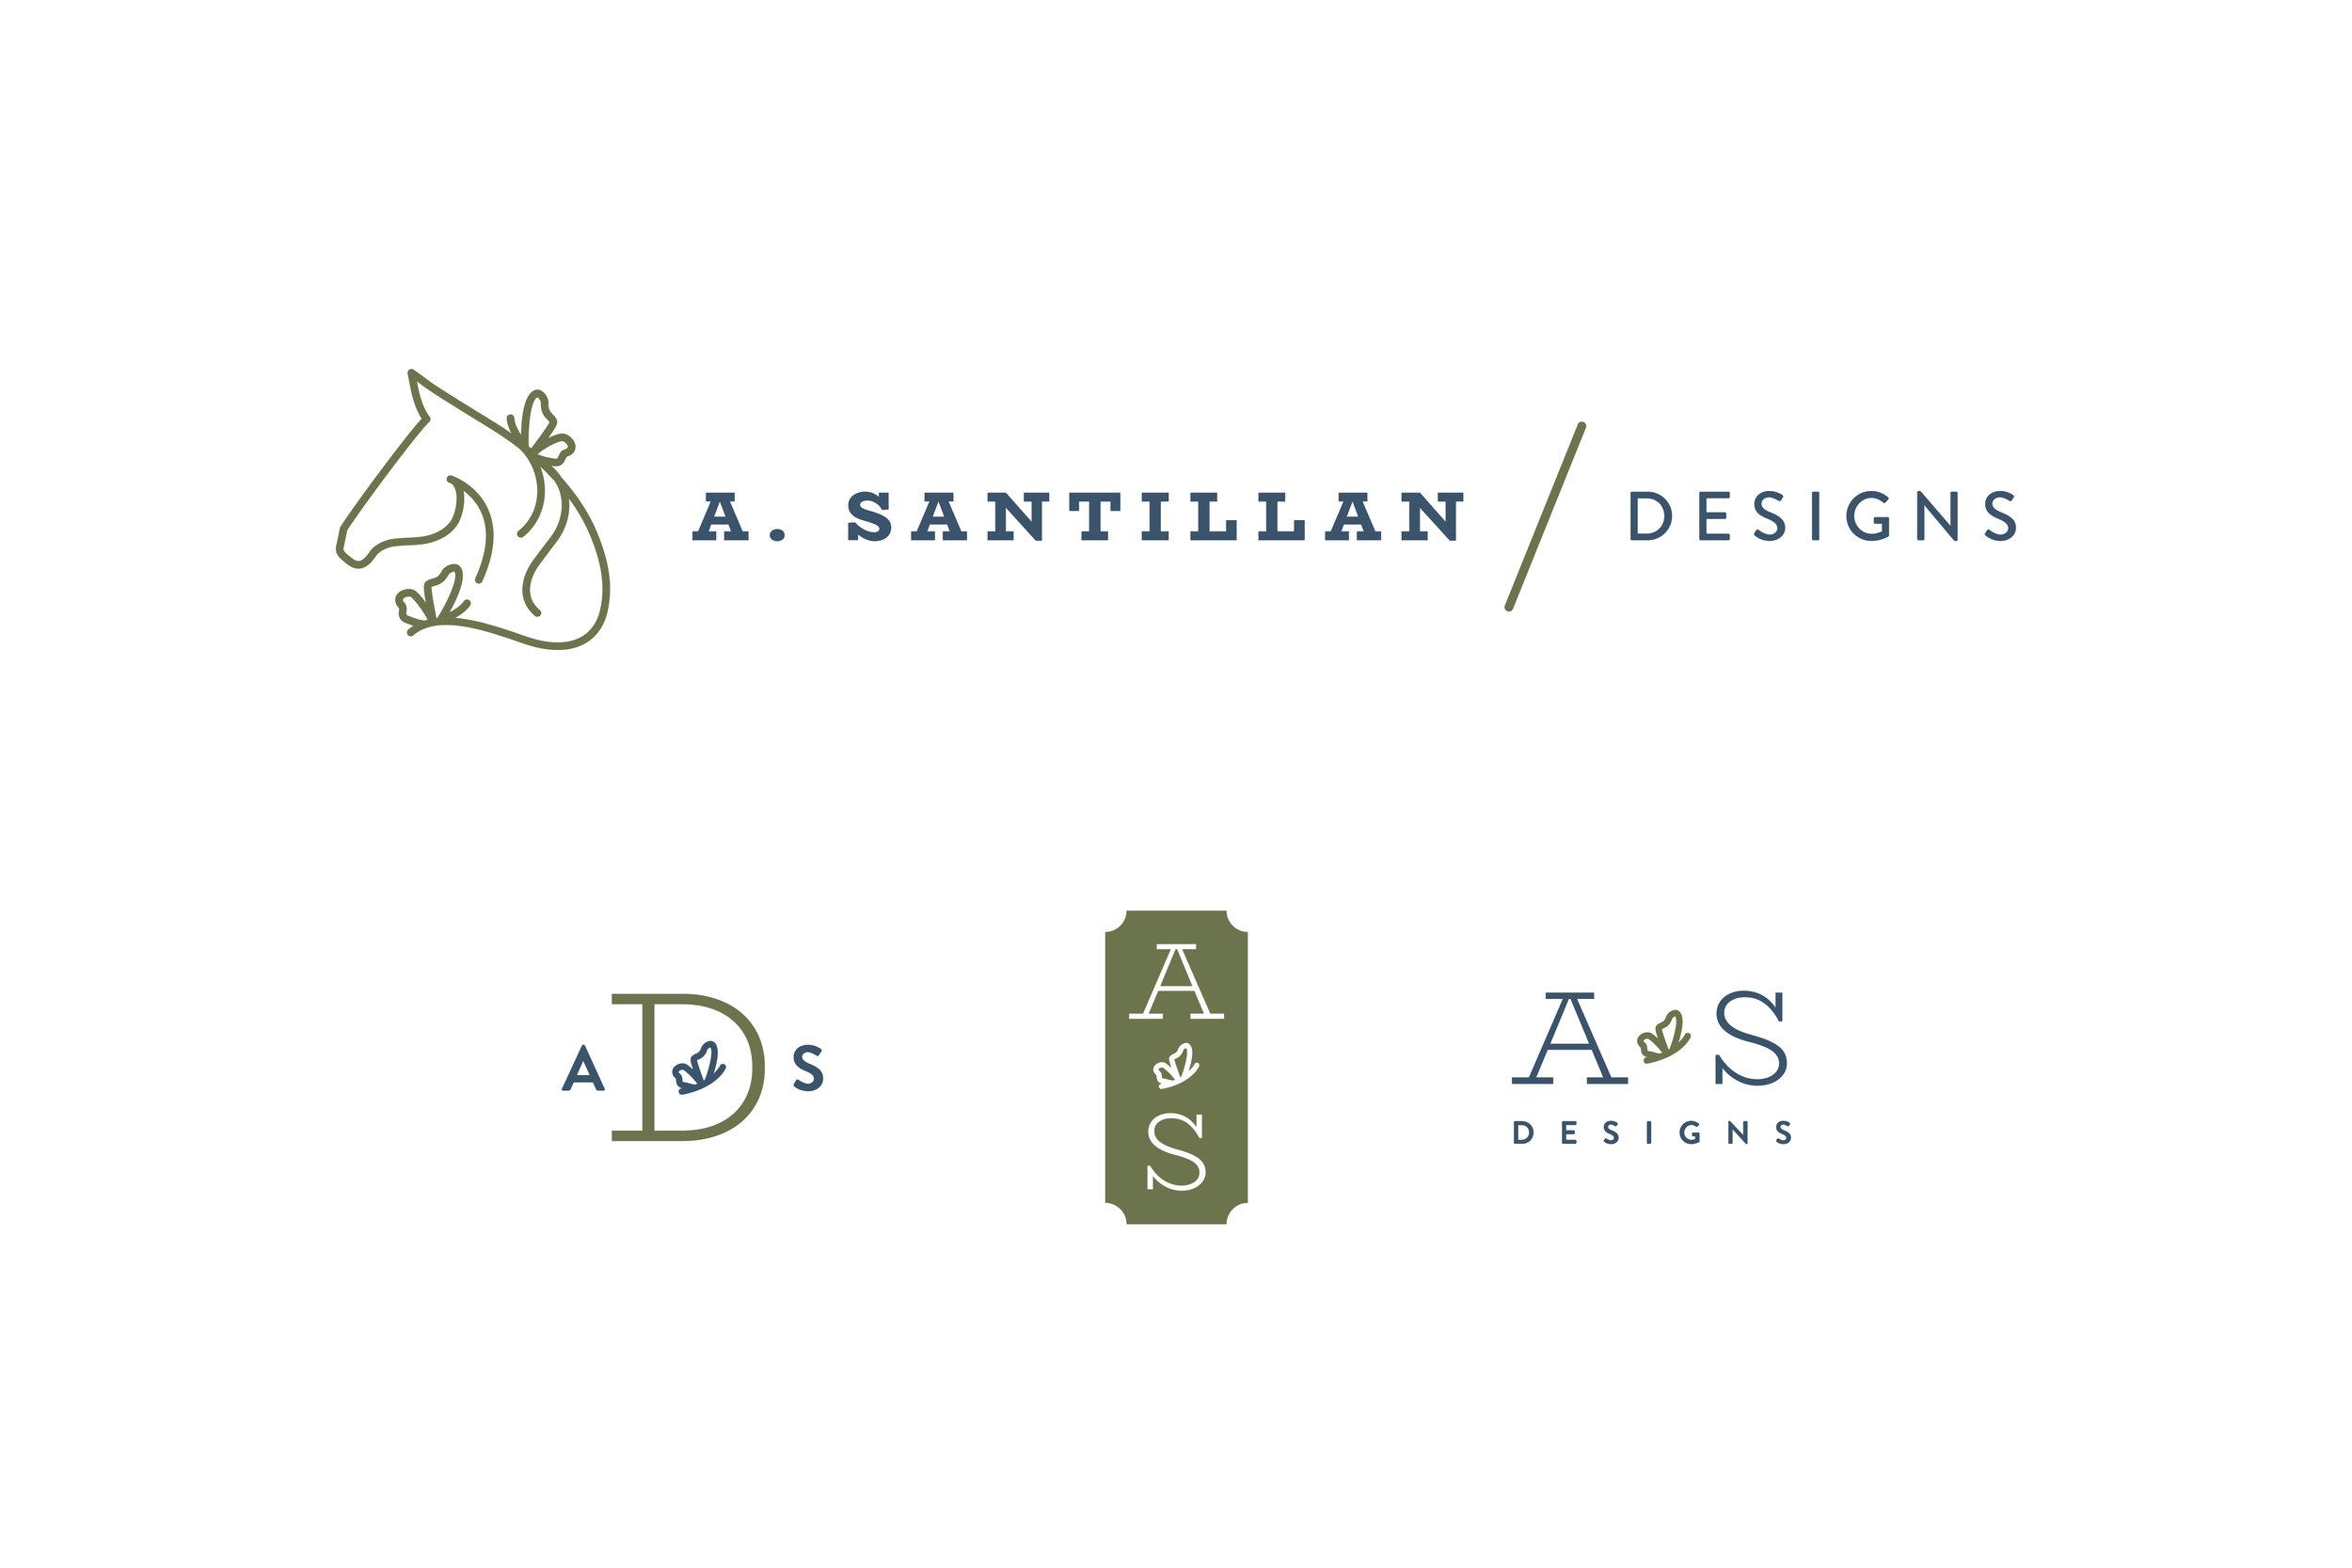 LynseyCreative_ASantillanDesigns_Portfolio_logos.jpg